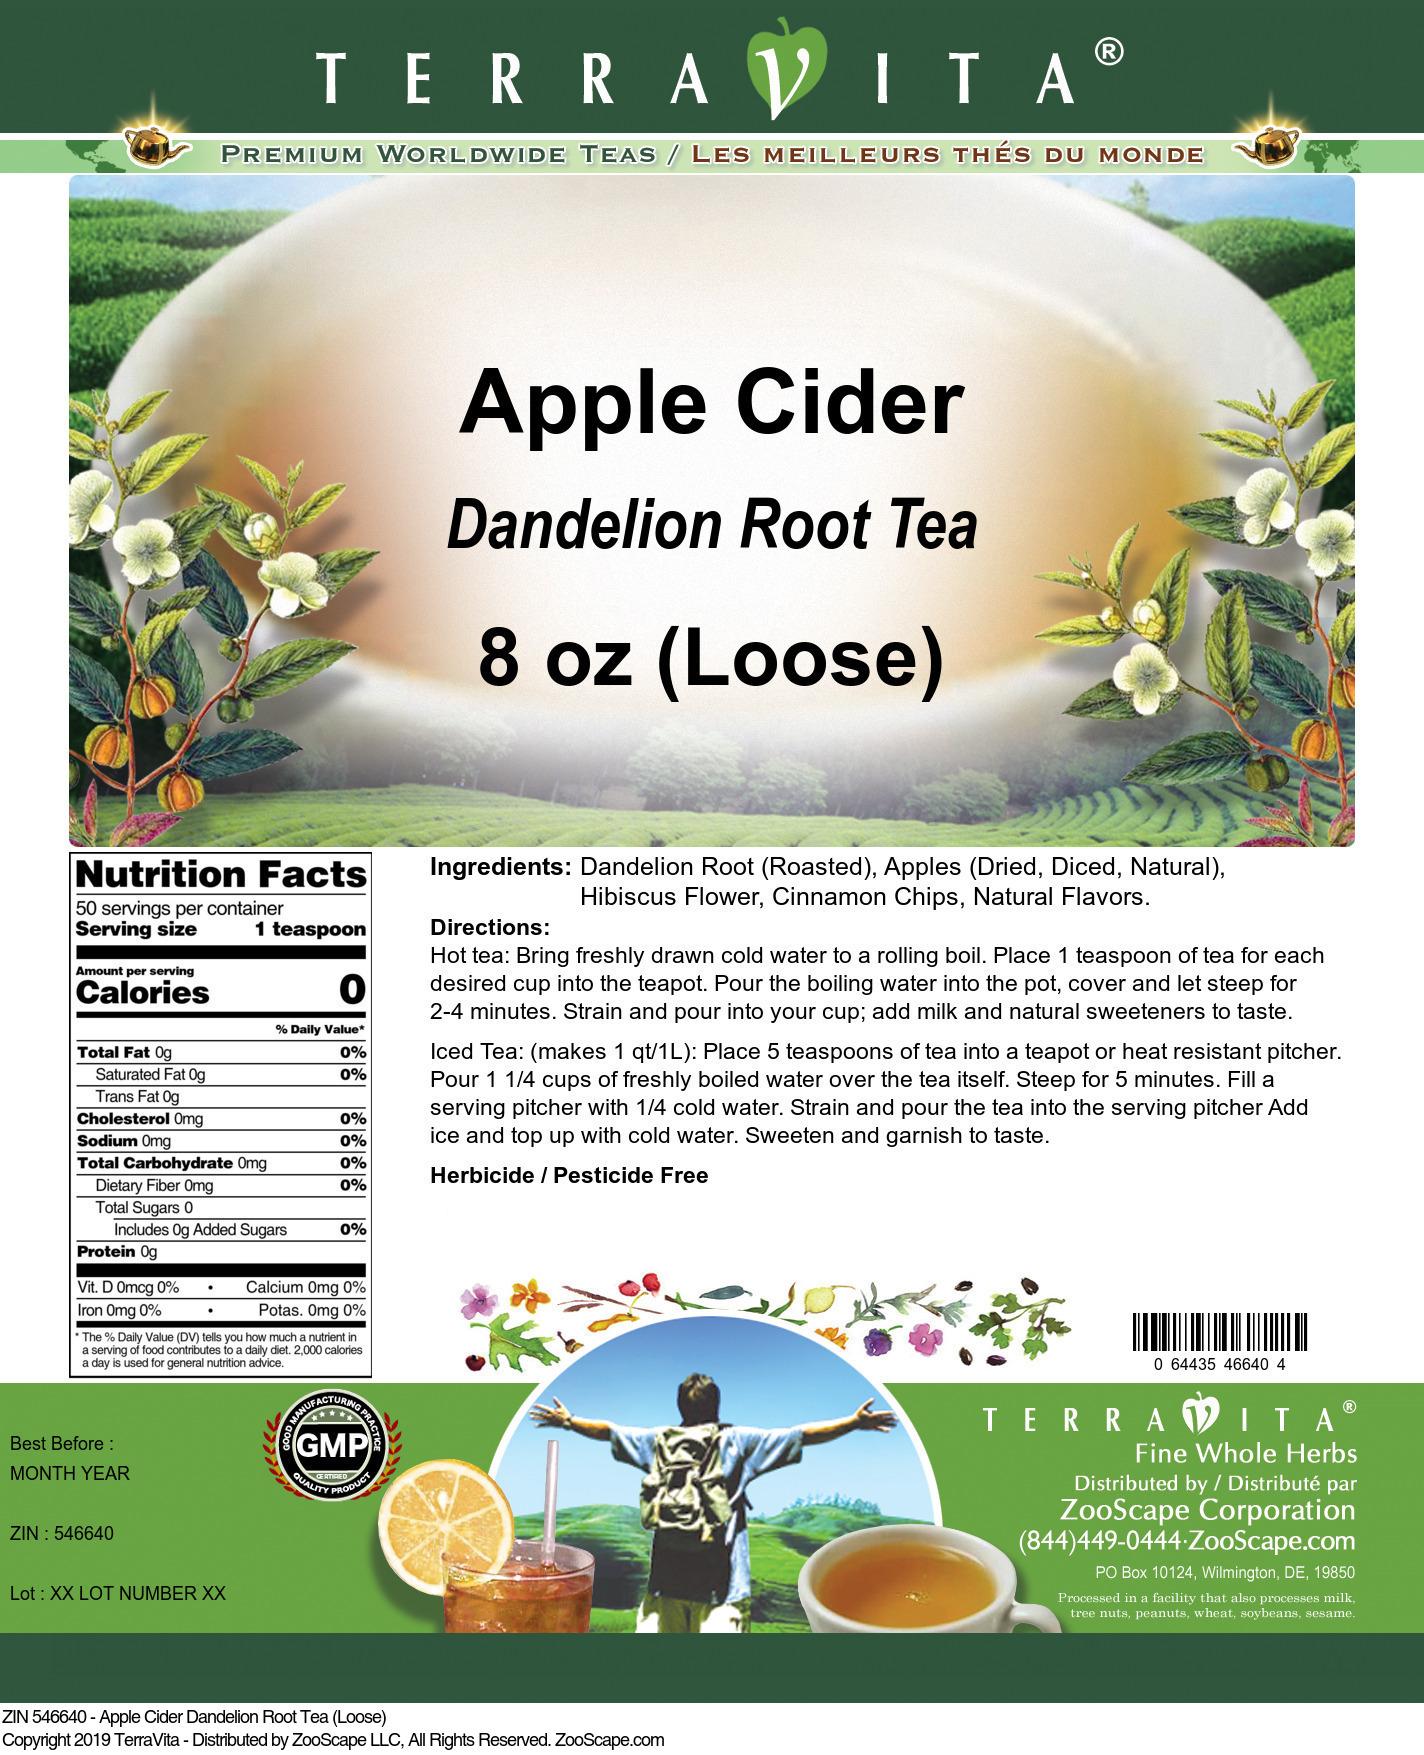 Apple Cider Dandelion Root Tea (Loose)